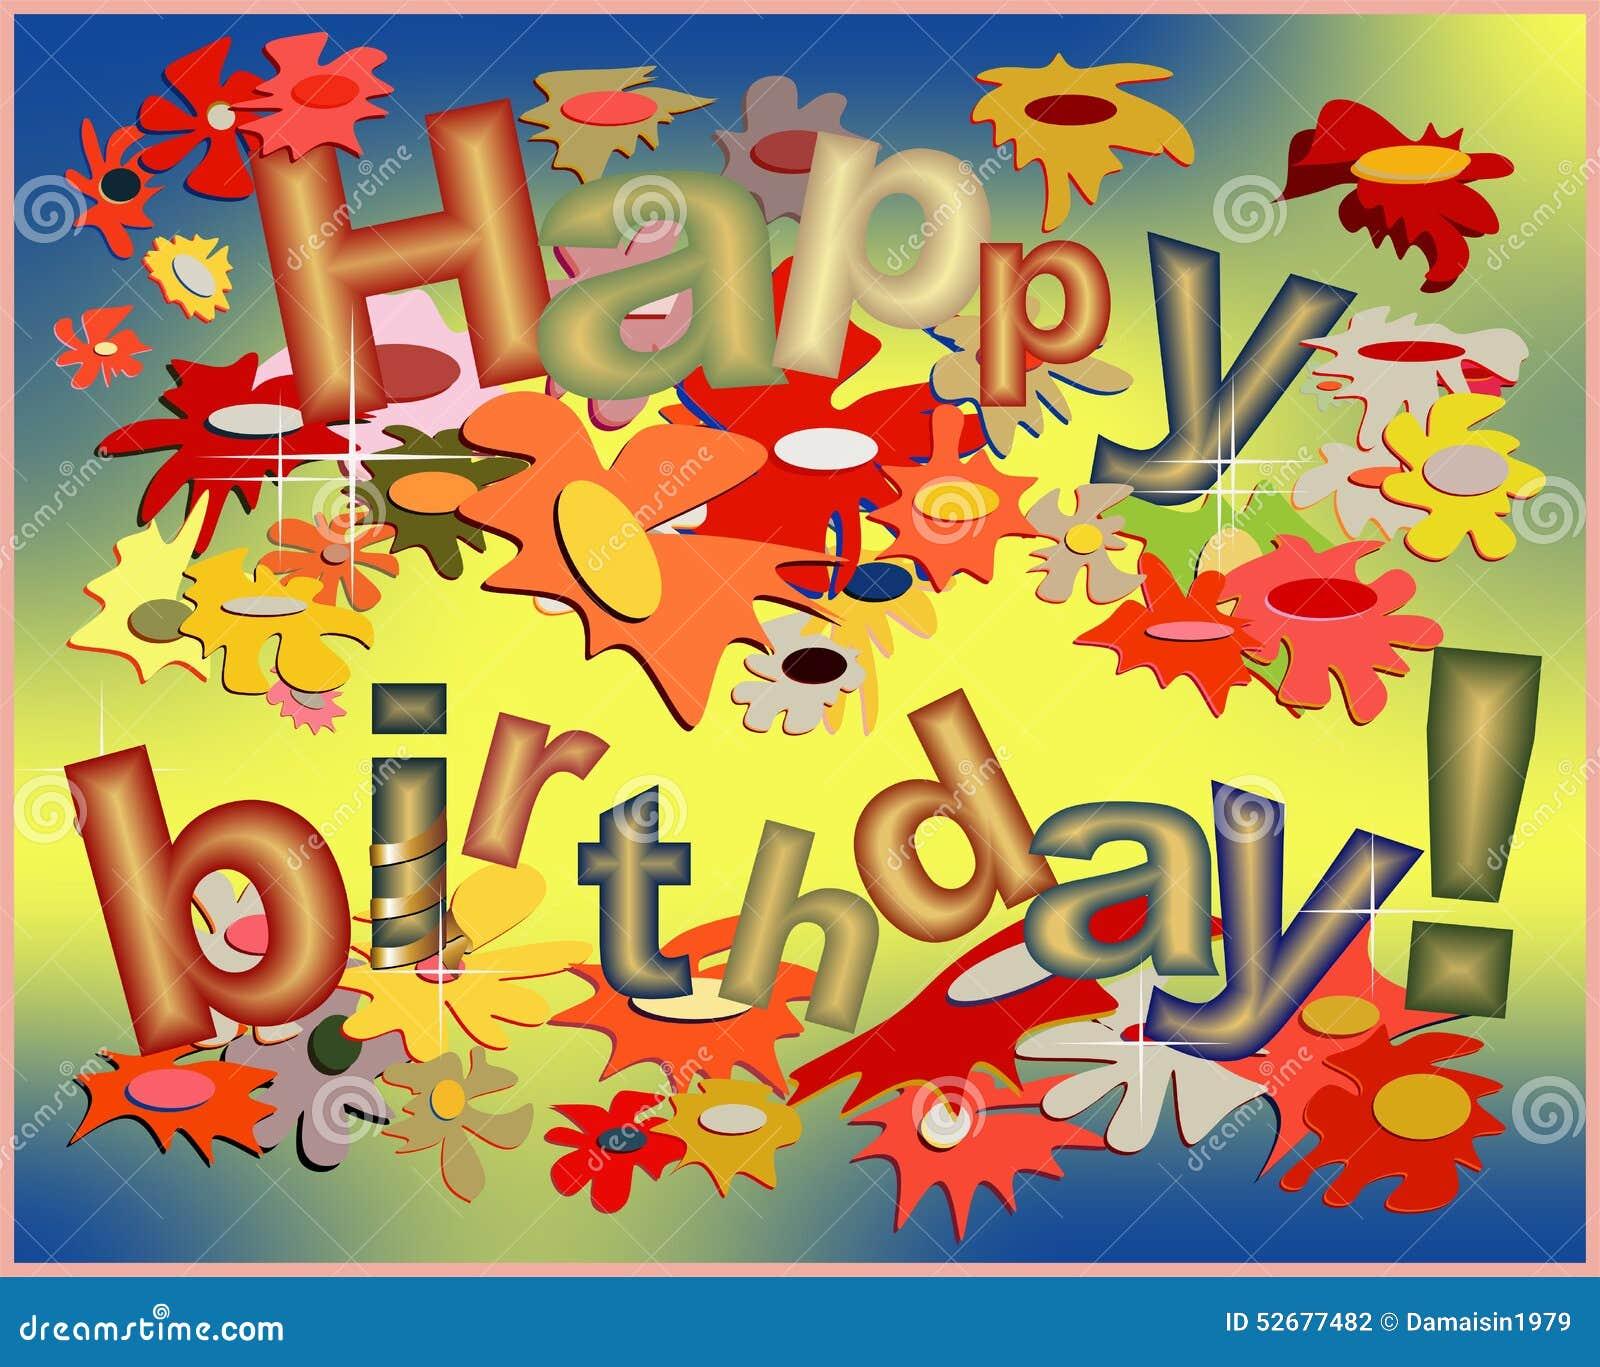 Happy Birthday Funny Card Stock Vector. Illustration Of